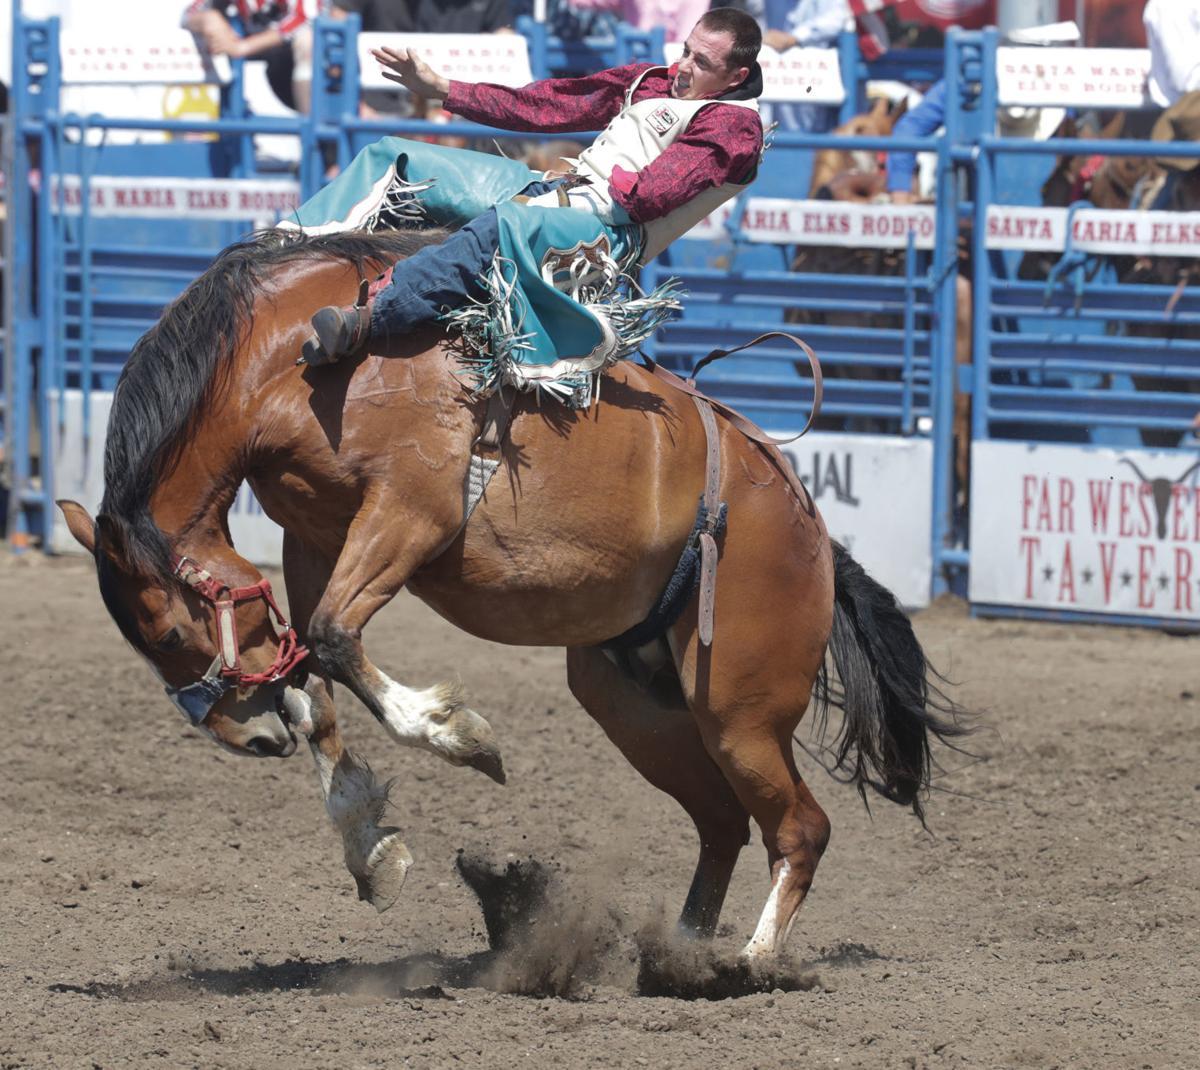 060318 Elks Rodeo Sunday 20.jpg